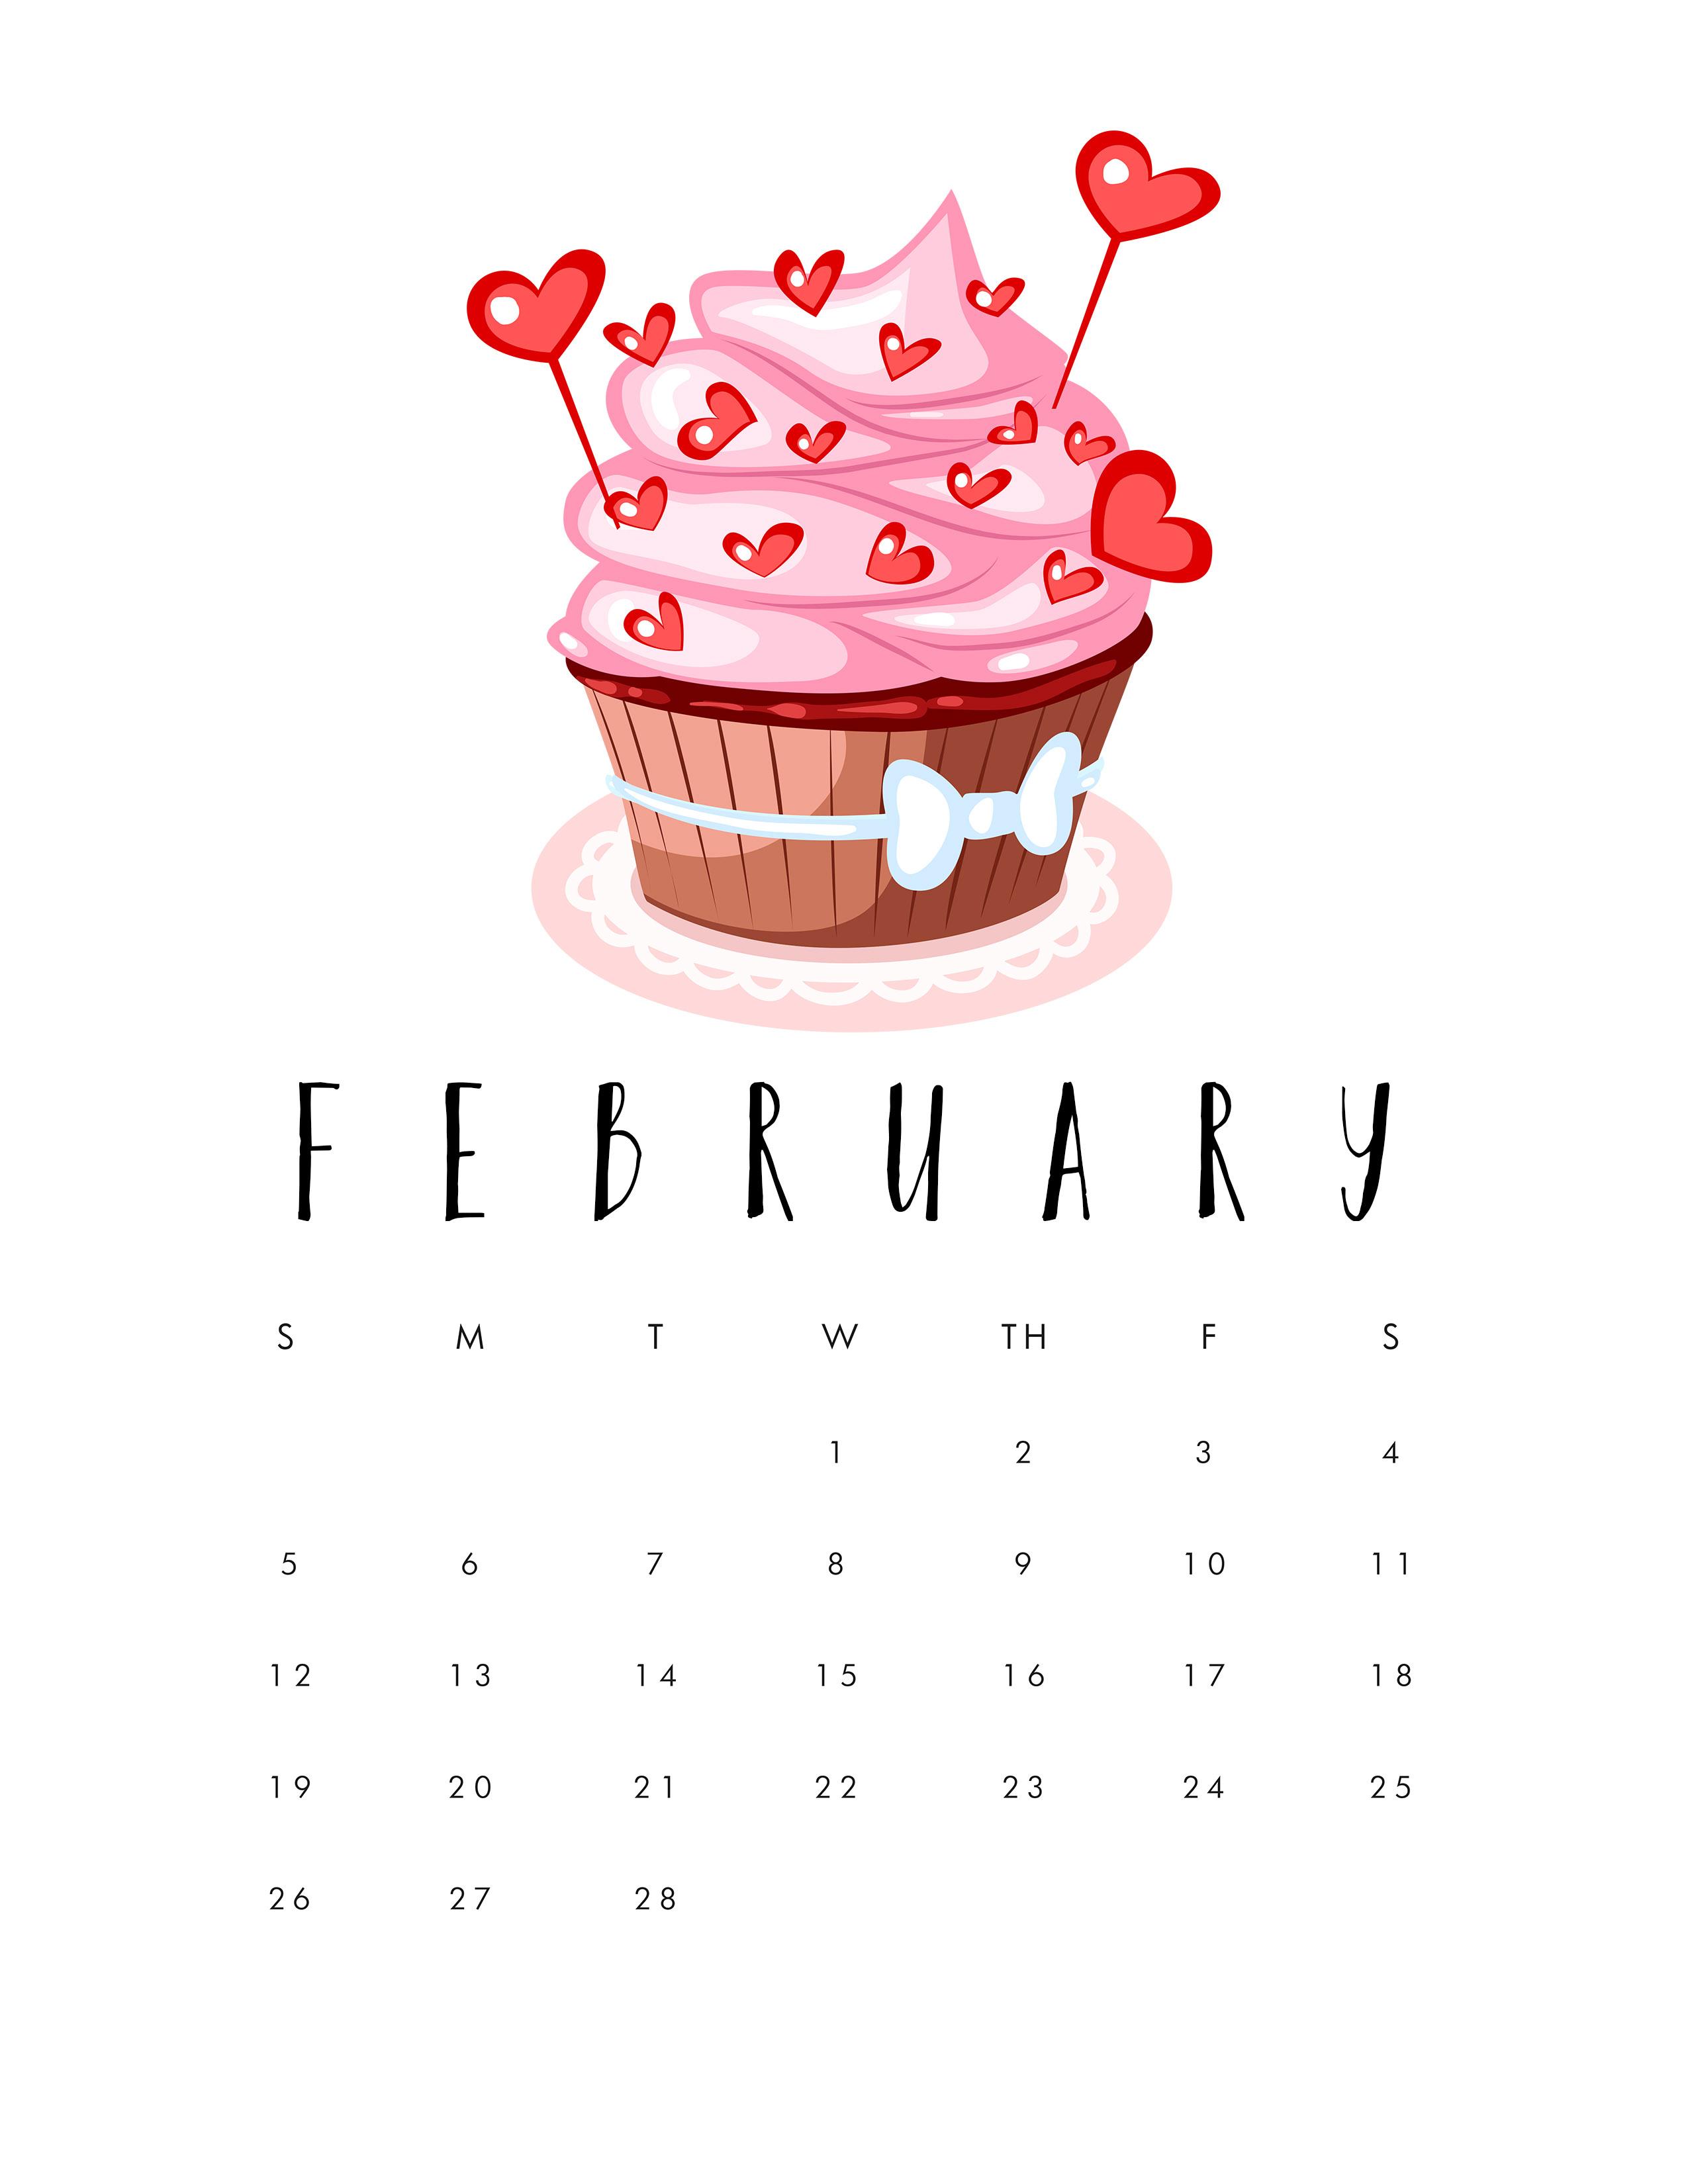 february cupcakes wallpaper - photo #8